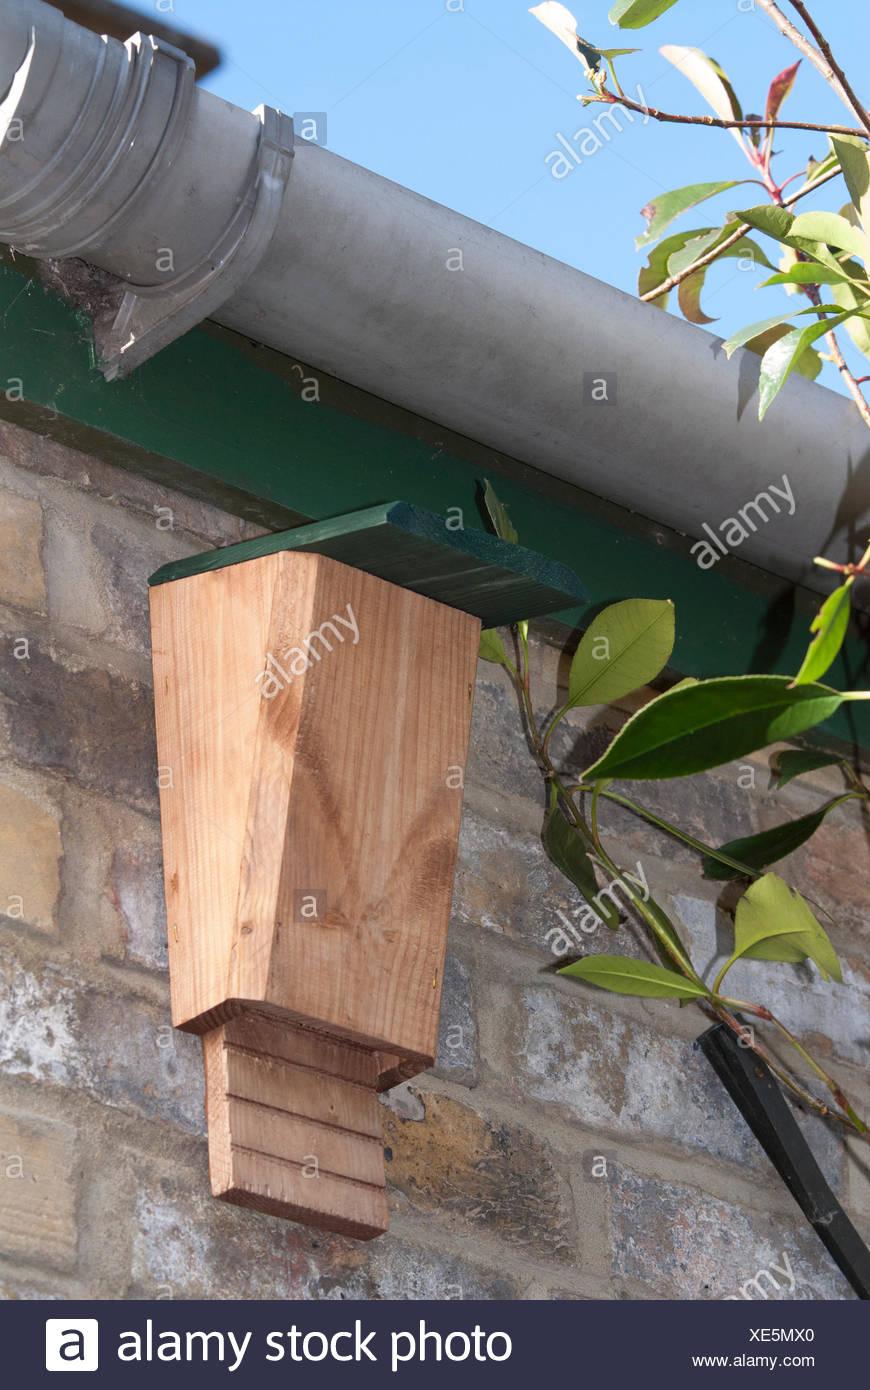 bat box high under eaves of house in garden for roosting bats uk